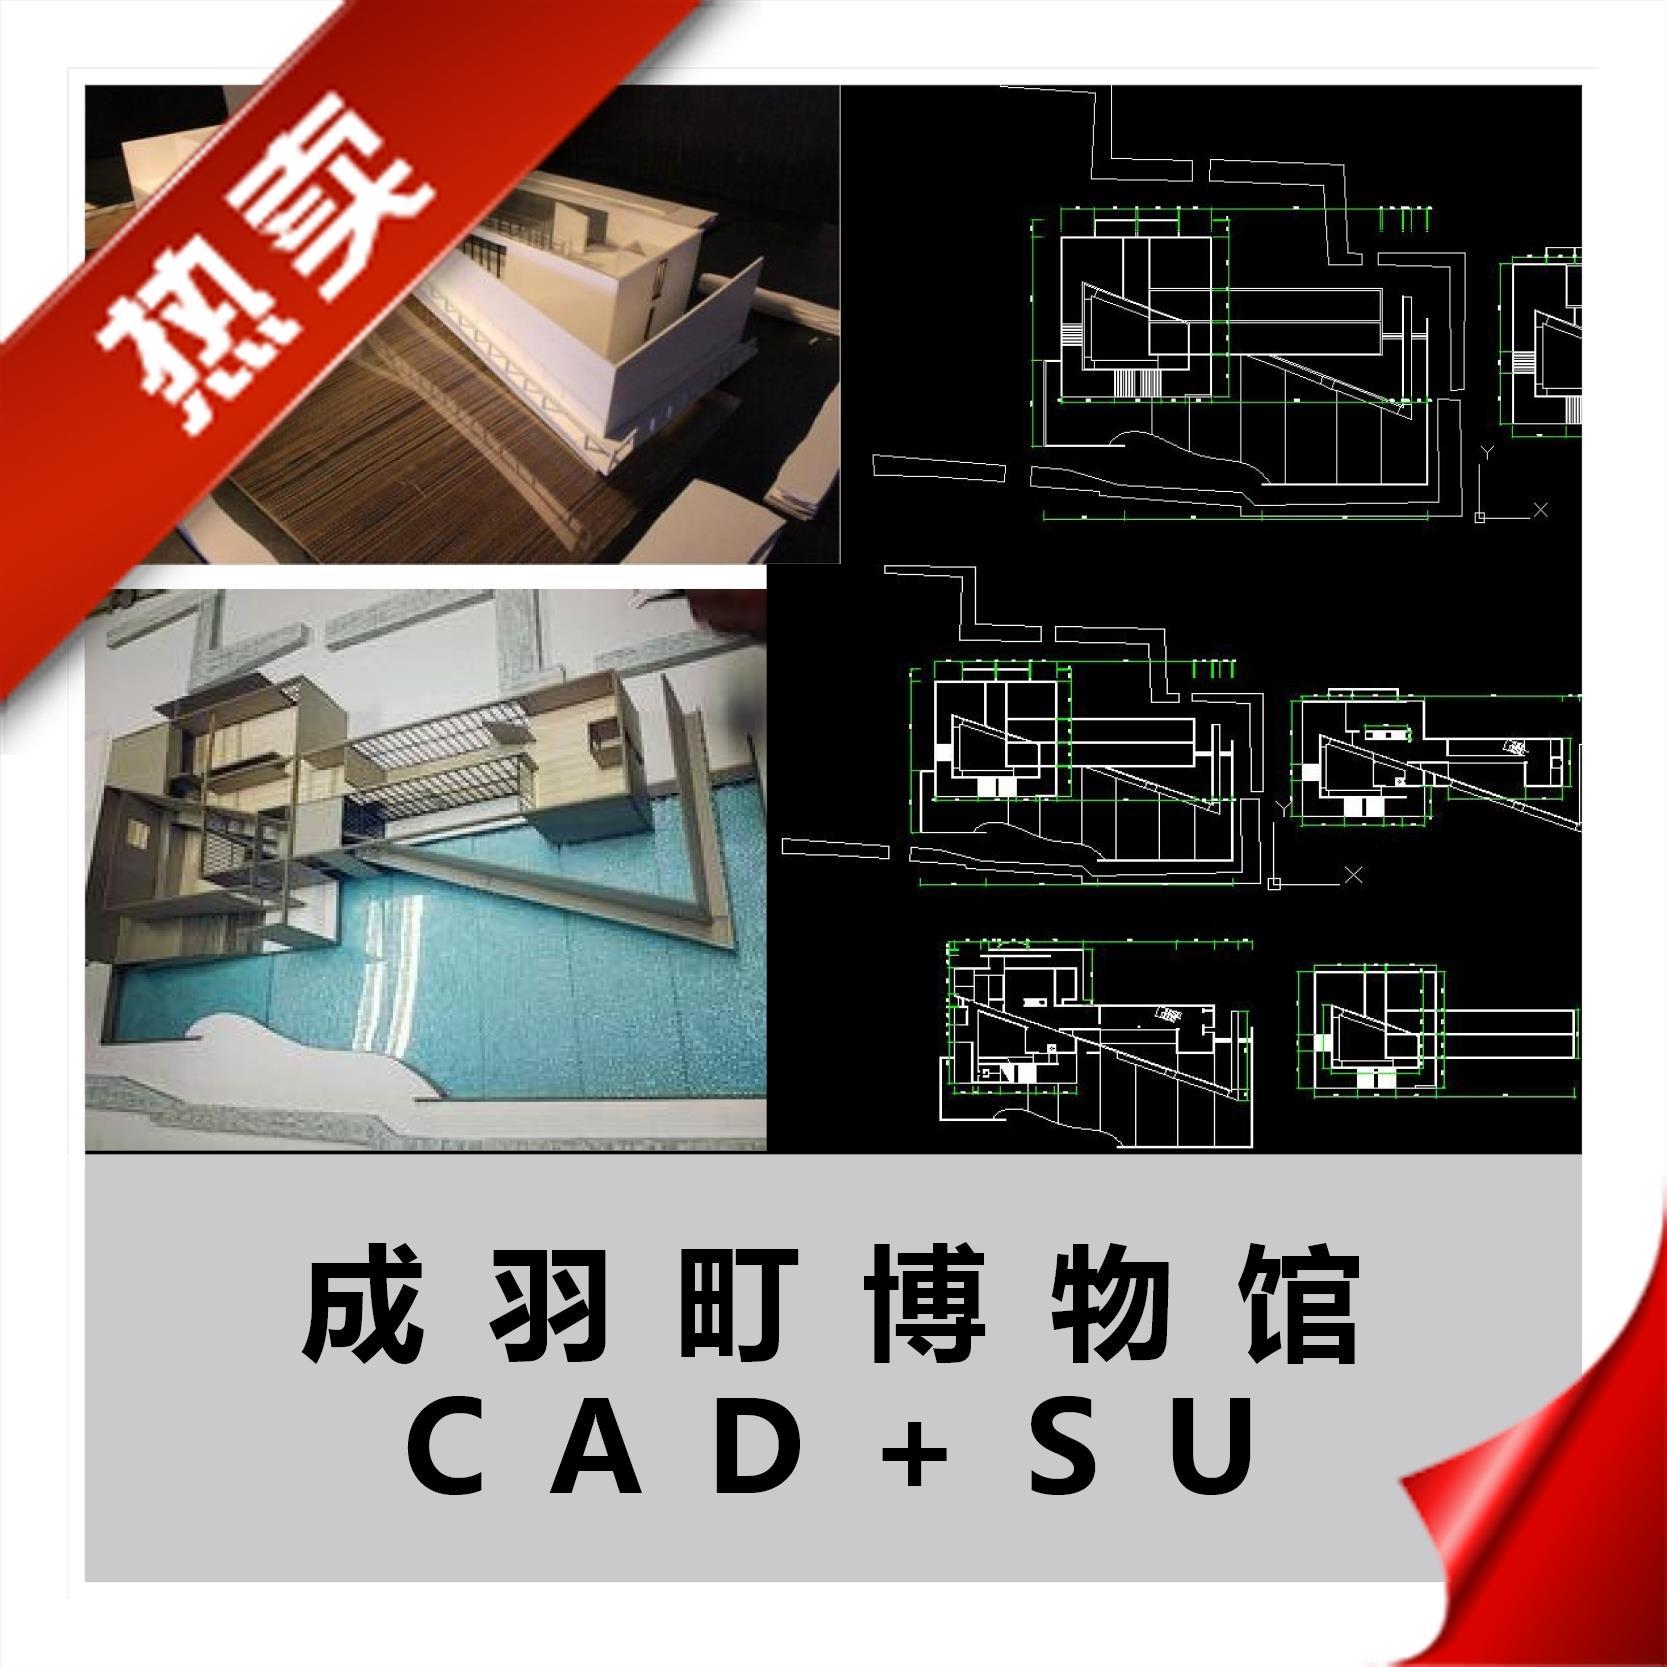 JZG0238成羽町美术馆 SU模型+cad平面含尺寸 安藤忠雄 Tadao Ando 艺术馆